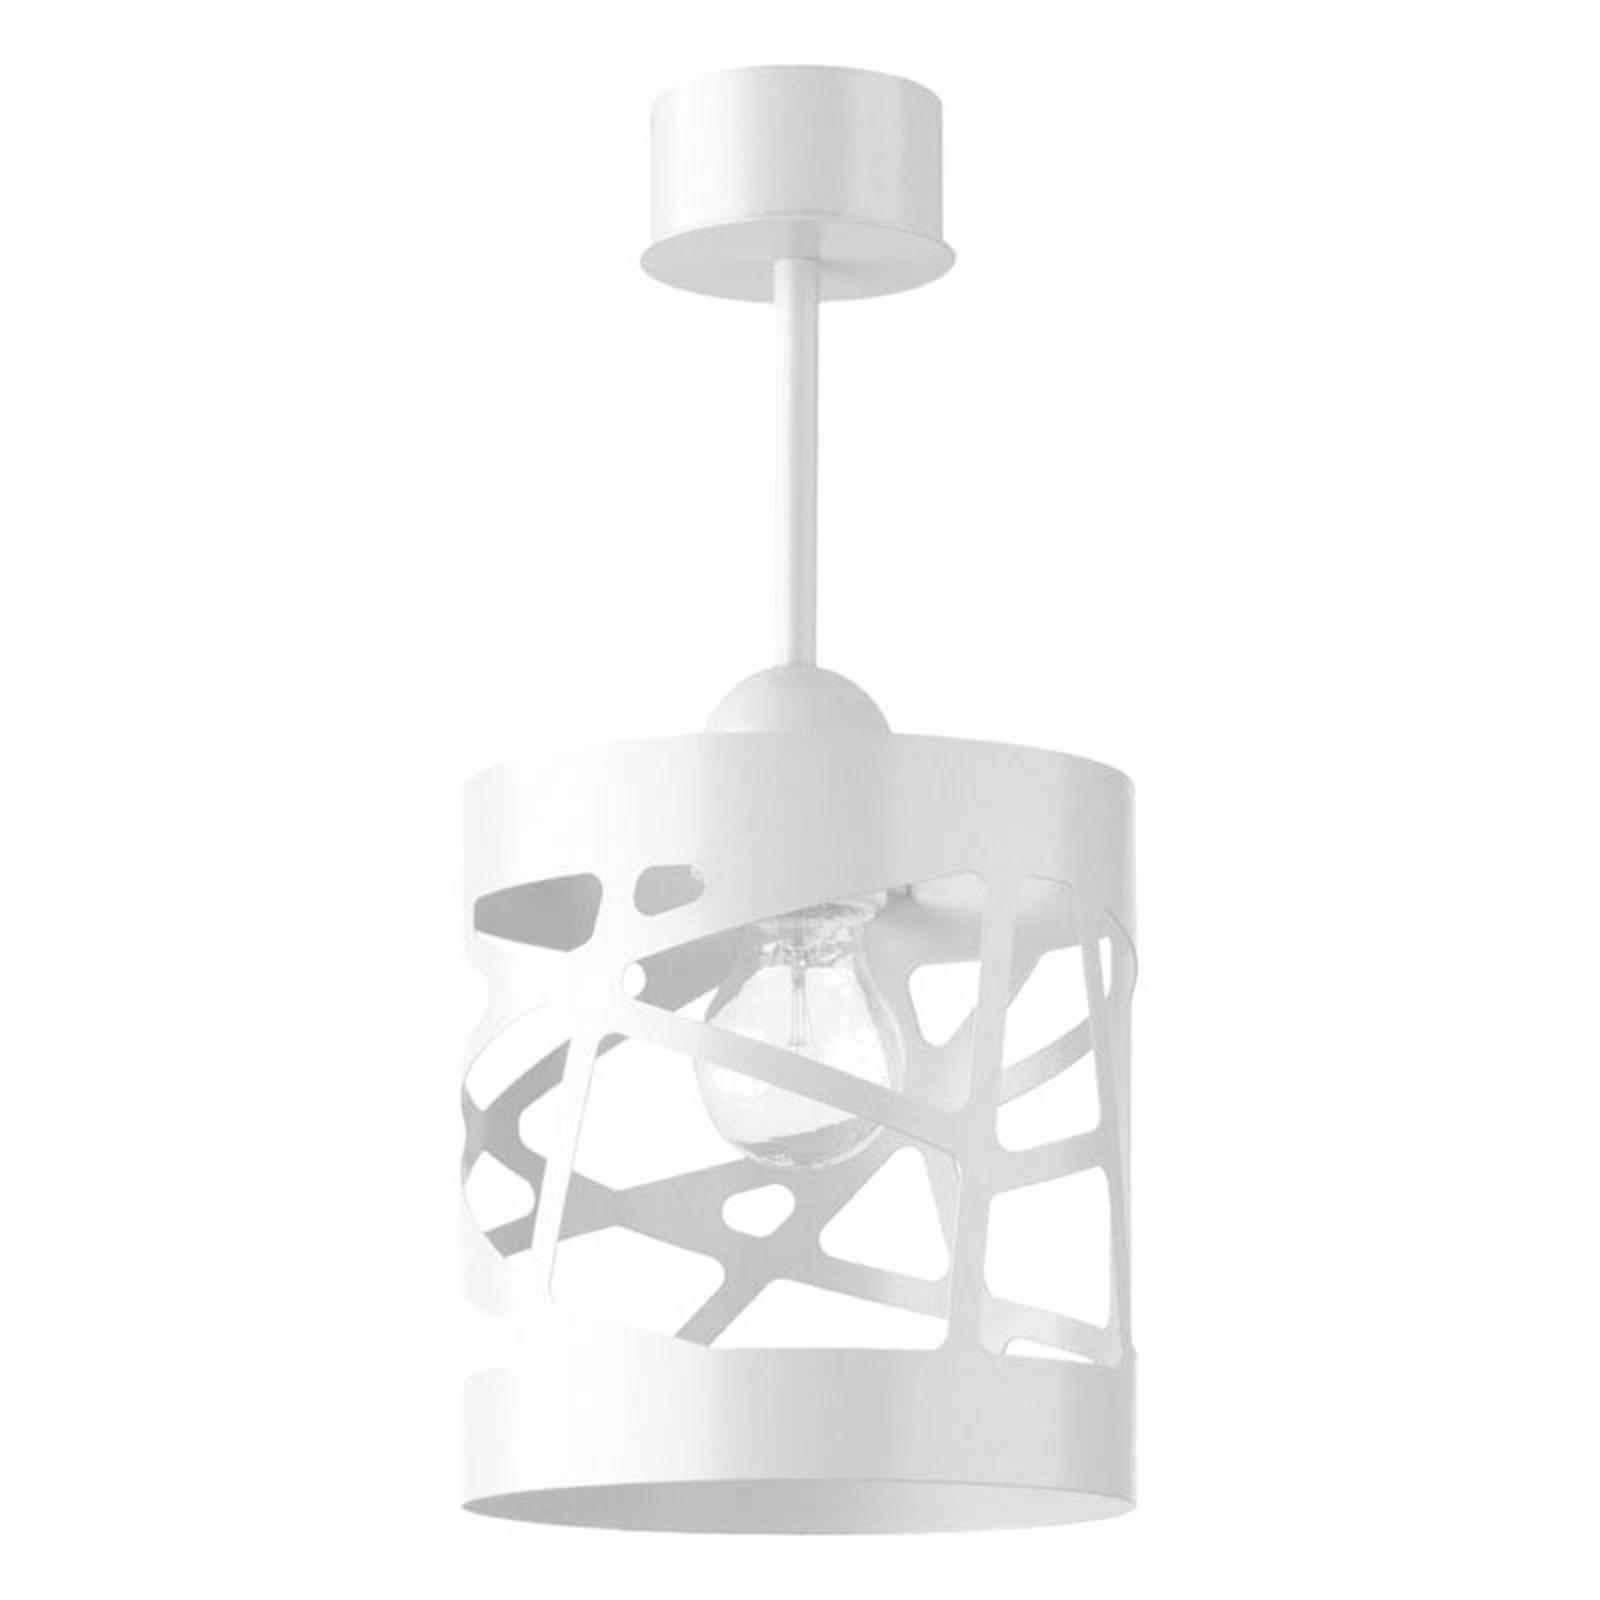 Kattovalaisin Modul Frez Ø 17,5 cm, valkoinen